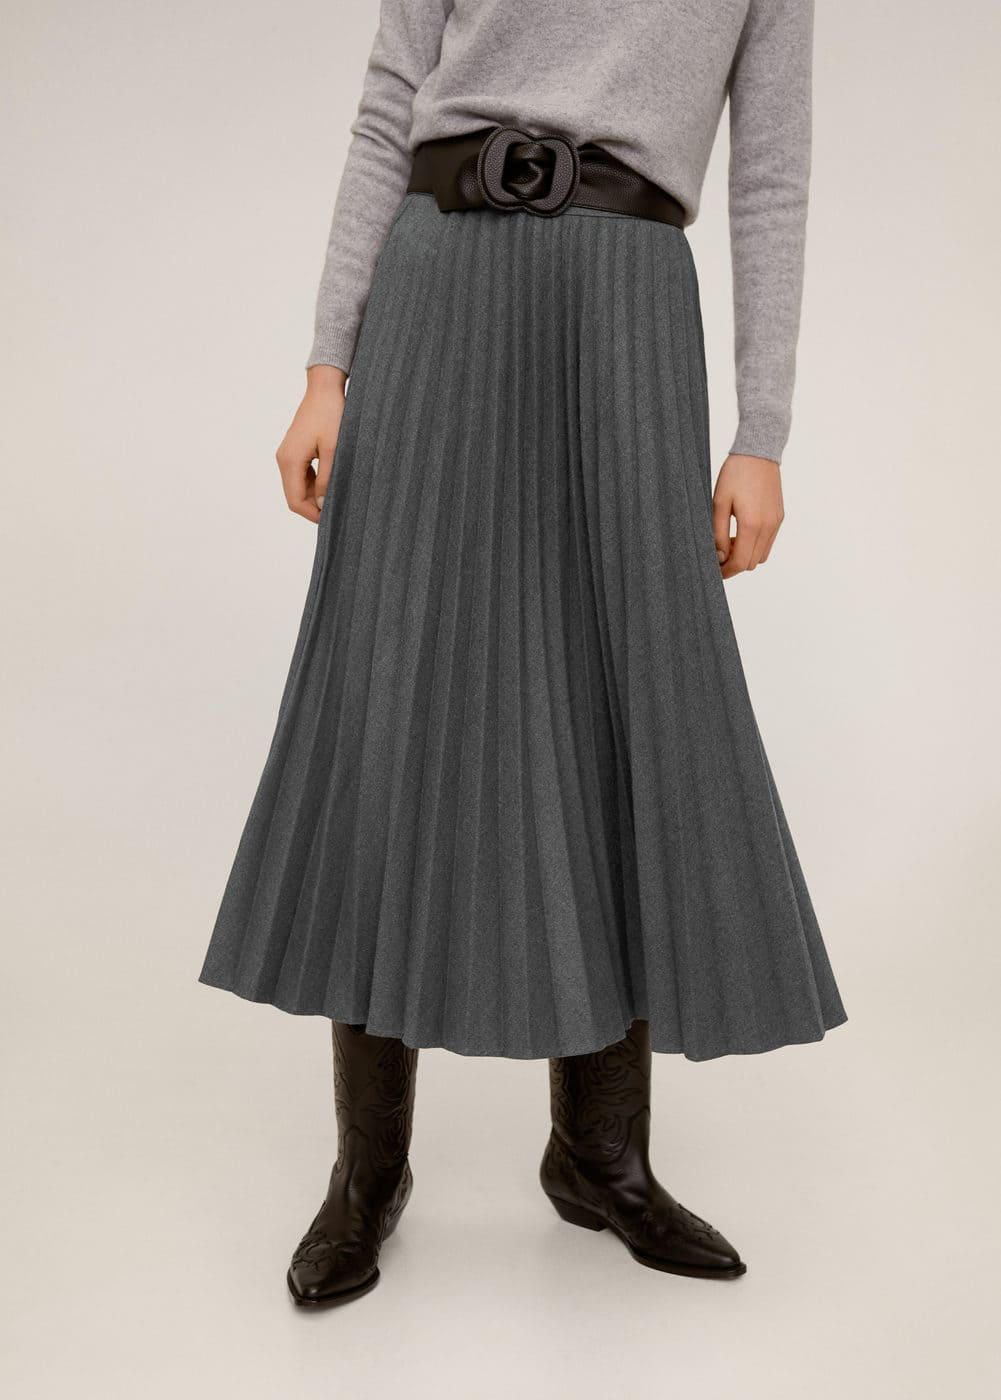 m-wooly:falda midi plisada